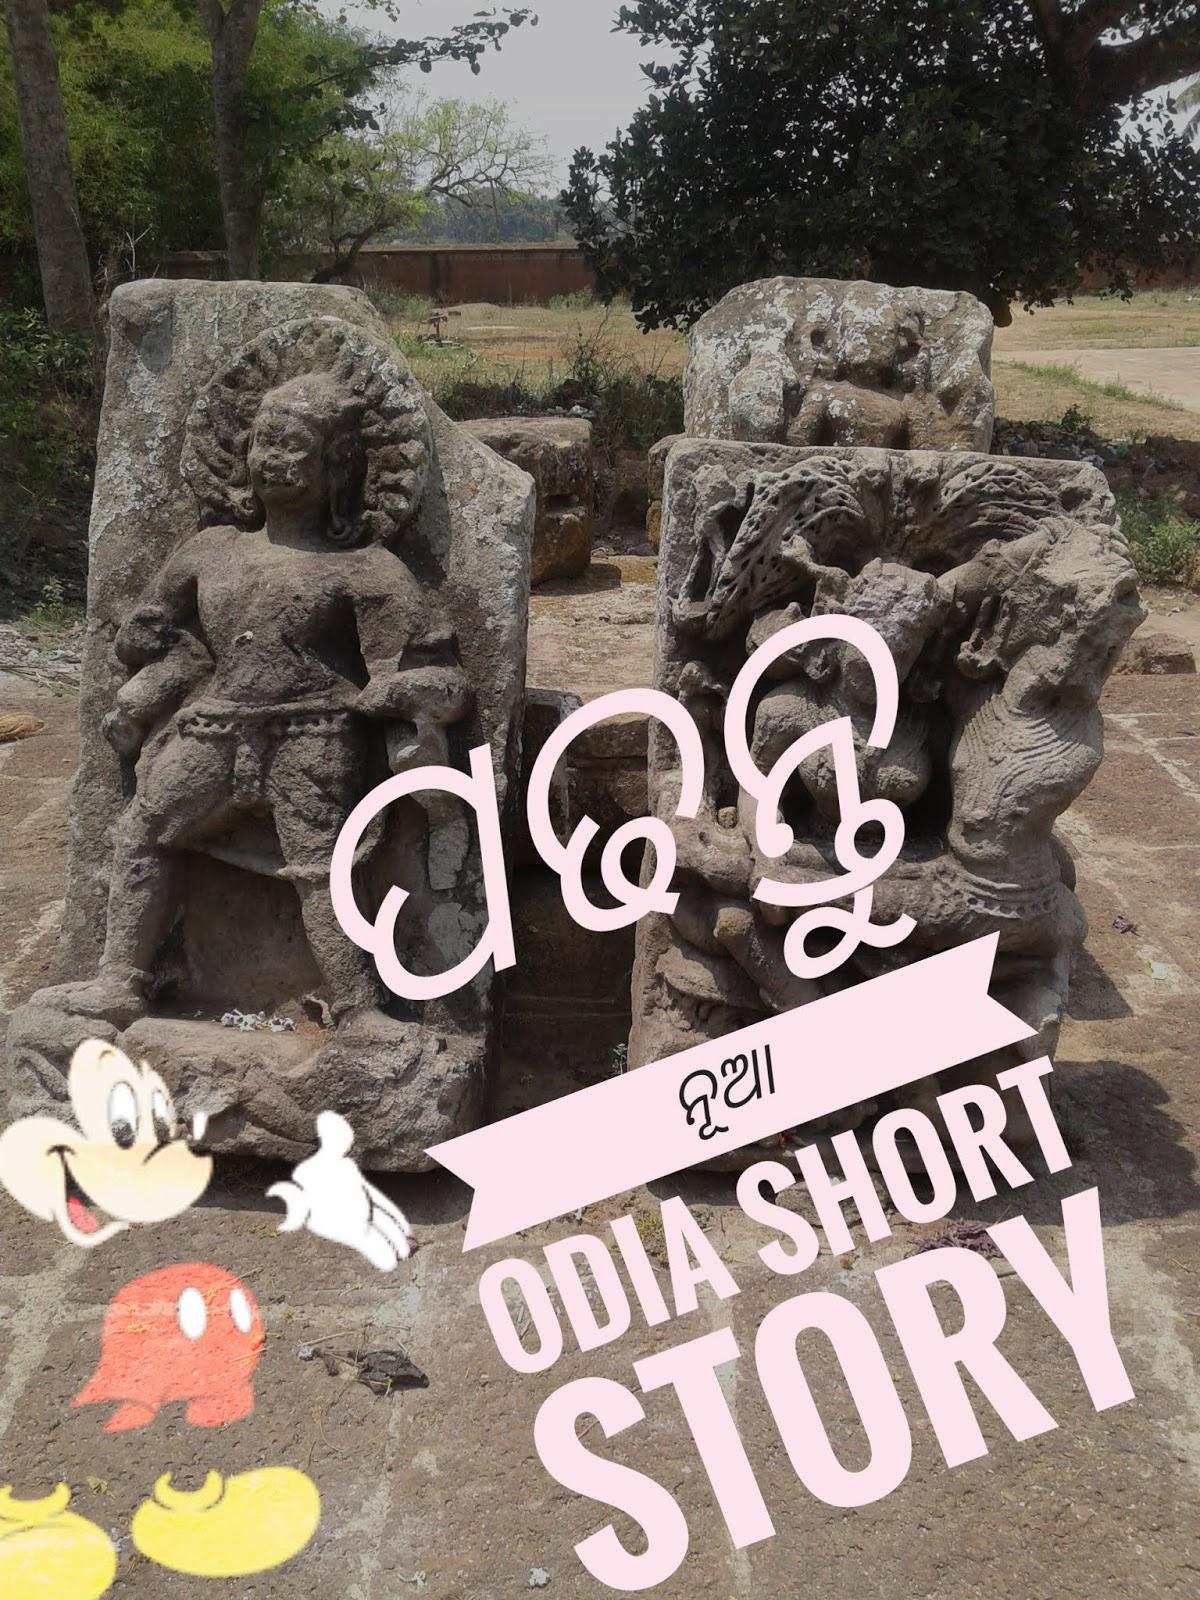 Ancient Odia Love Story, Twist Odia Love Story - Odia -5860